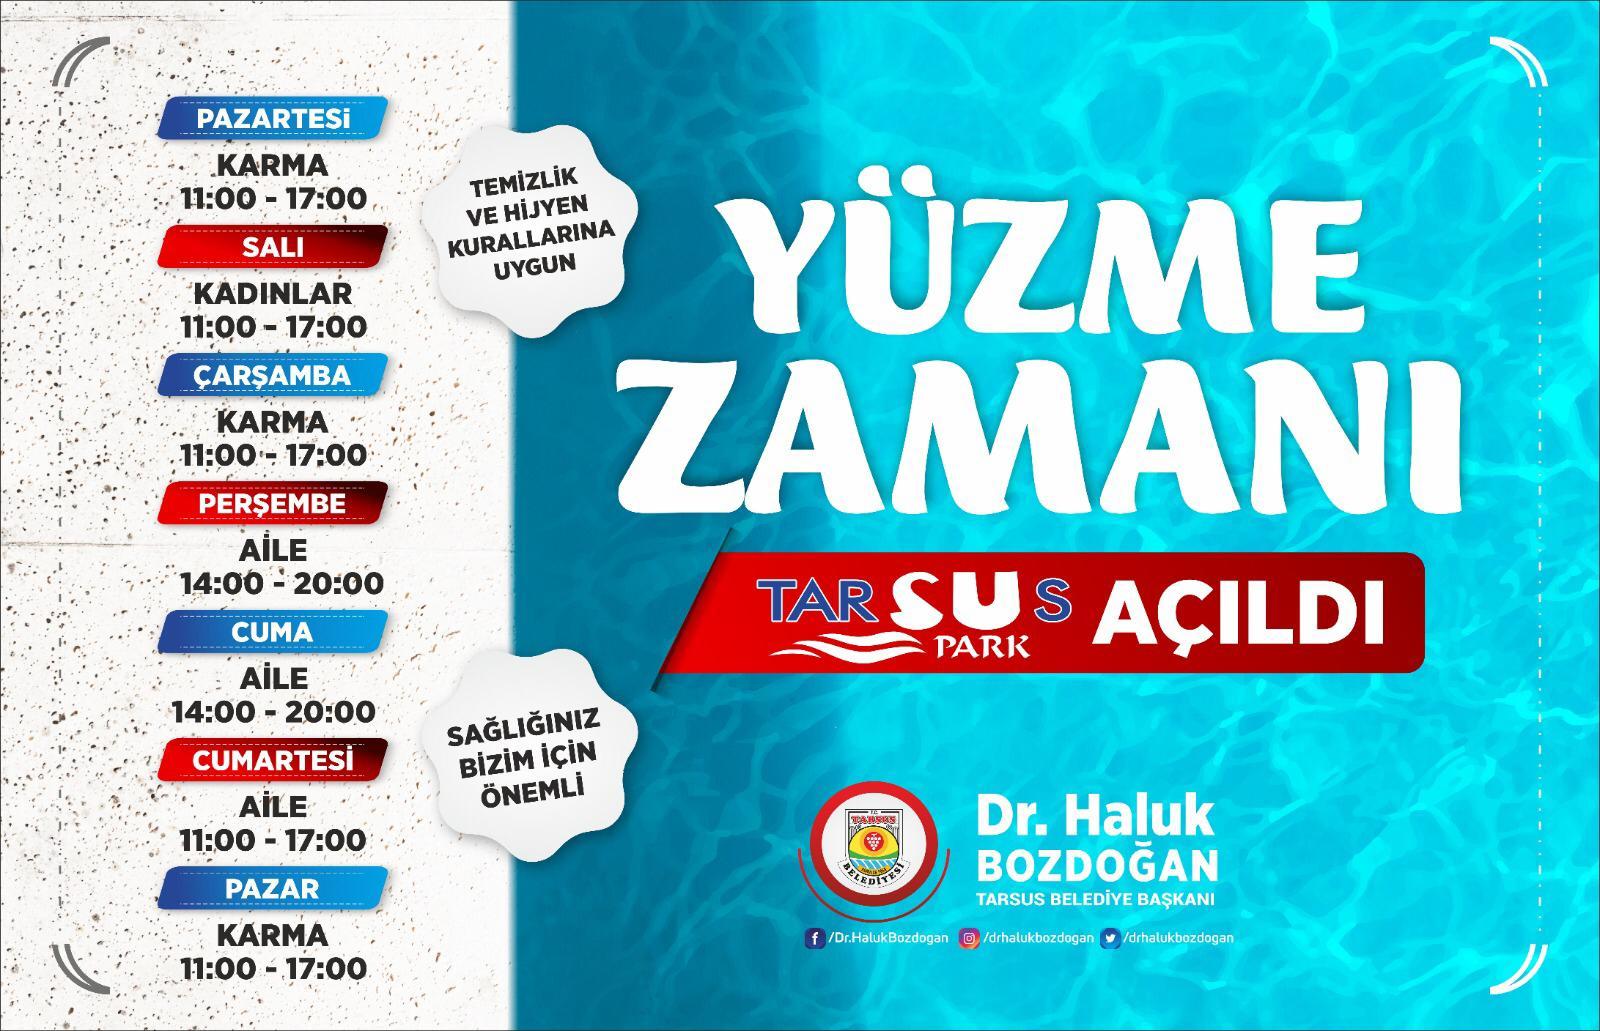 'TARSUS SU PARK' SEZONA MERHABA DEDİ